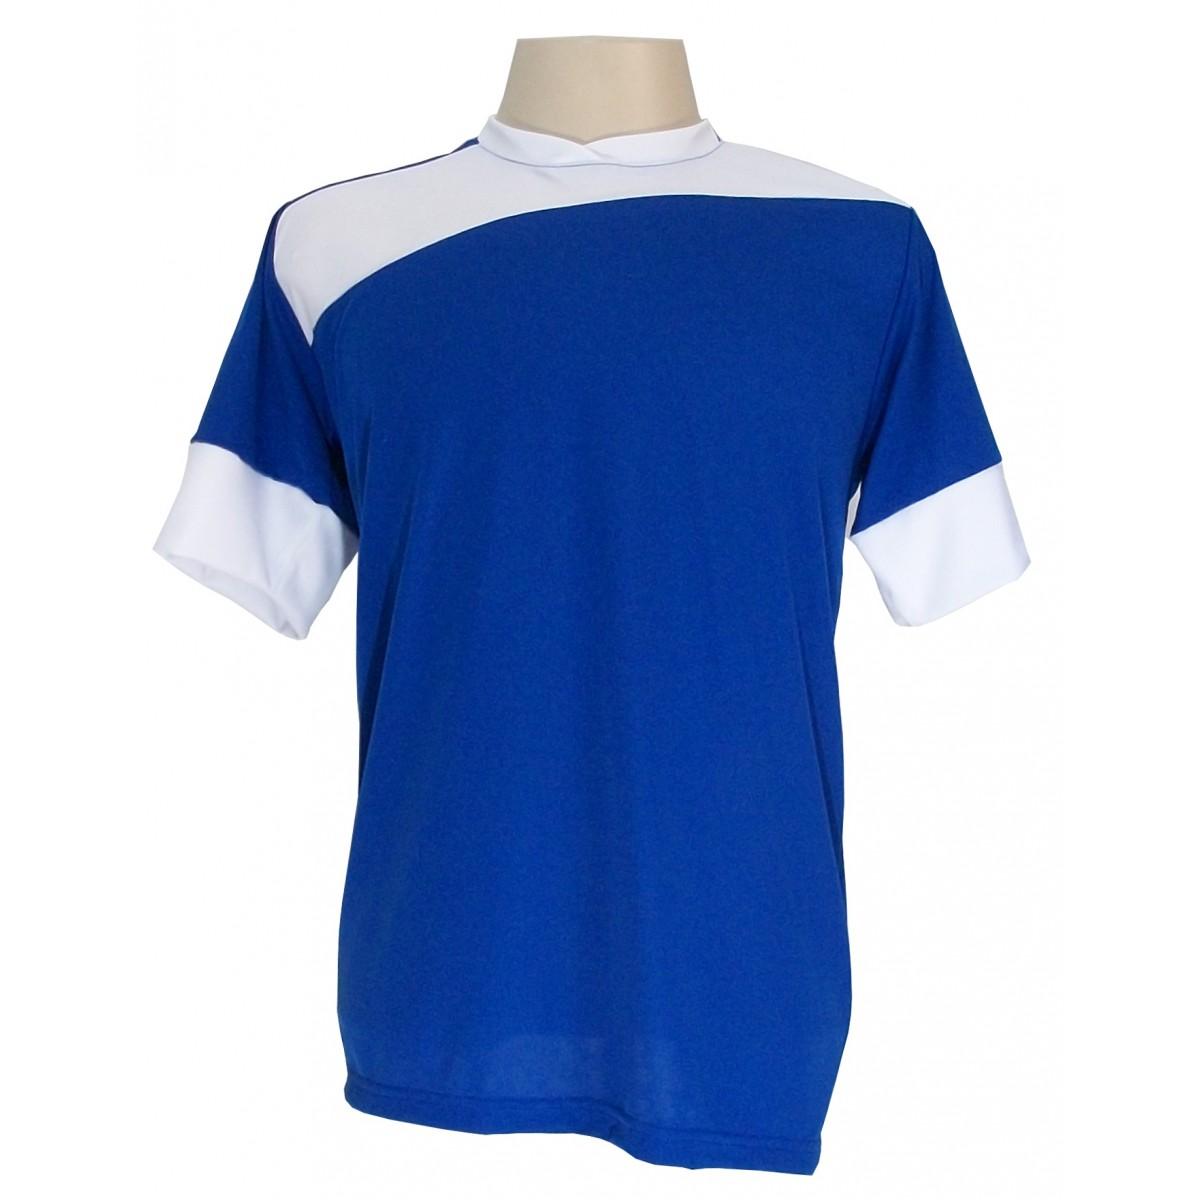 Jogo de Camisa com 14 pe�as modelo Sporting Royal/Branco - Frete Gr�tis Brasil + Brindes